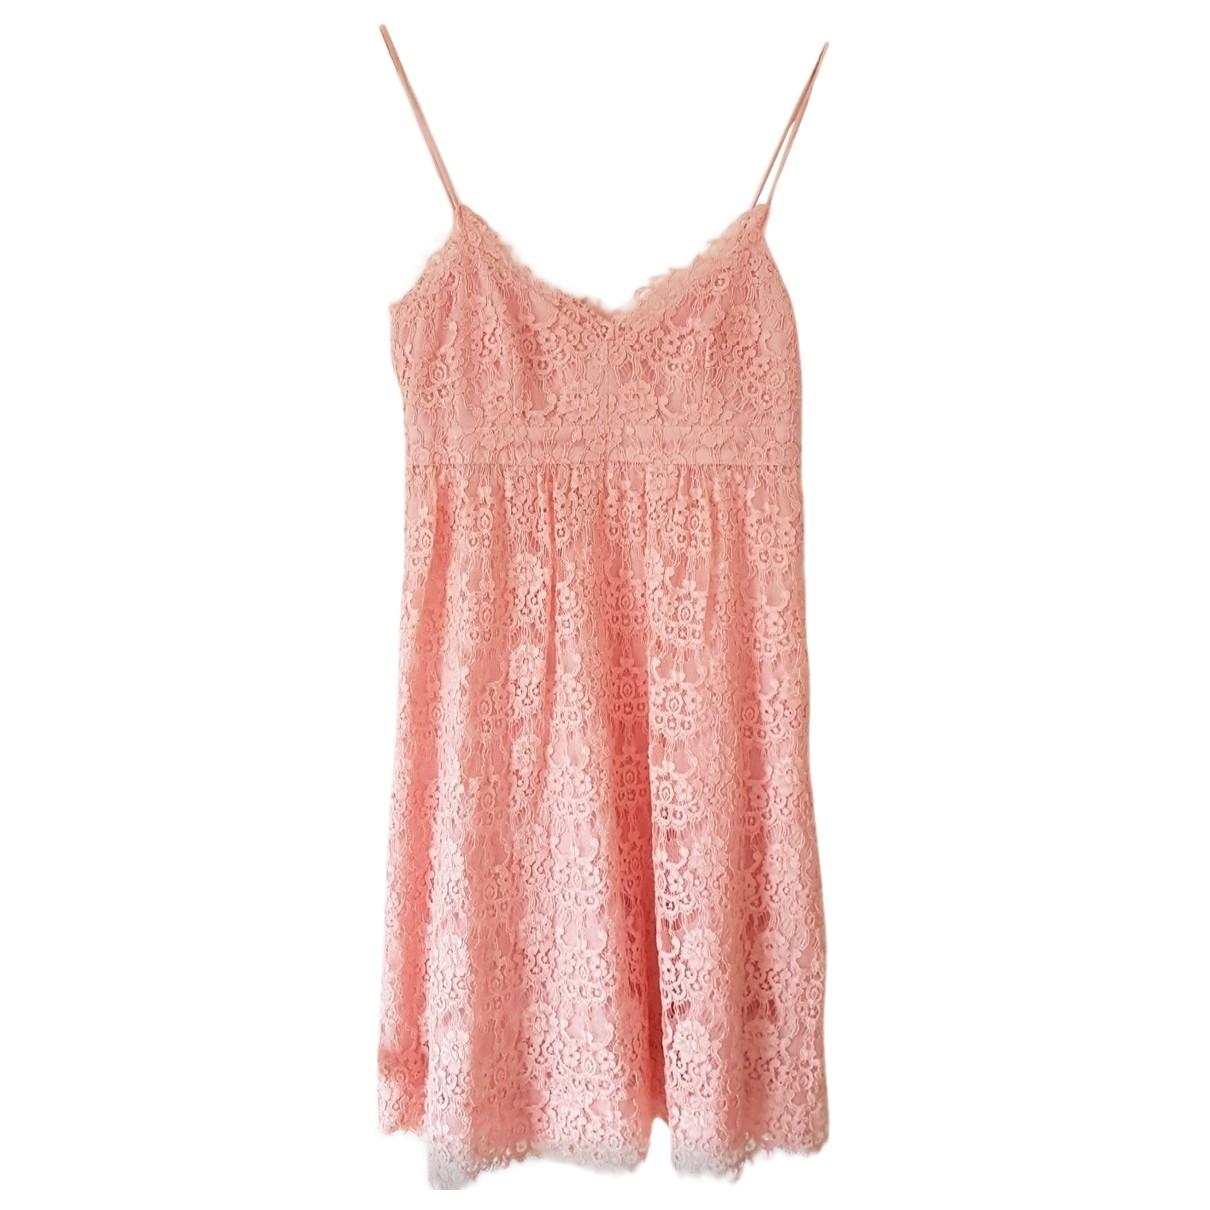 Claudie Pierlot \N Pink Lace dress for Women 36 FR